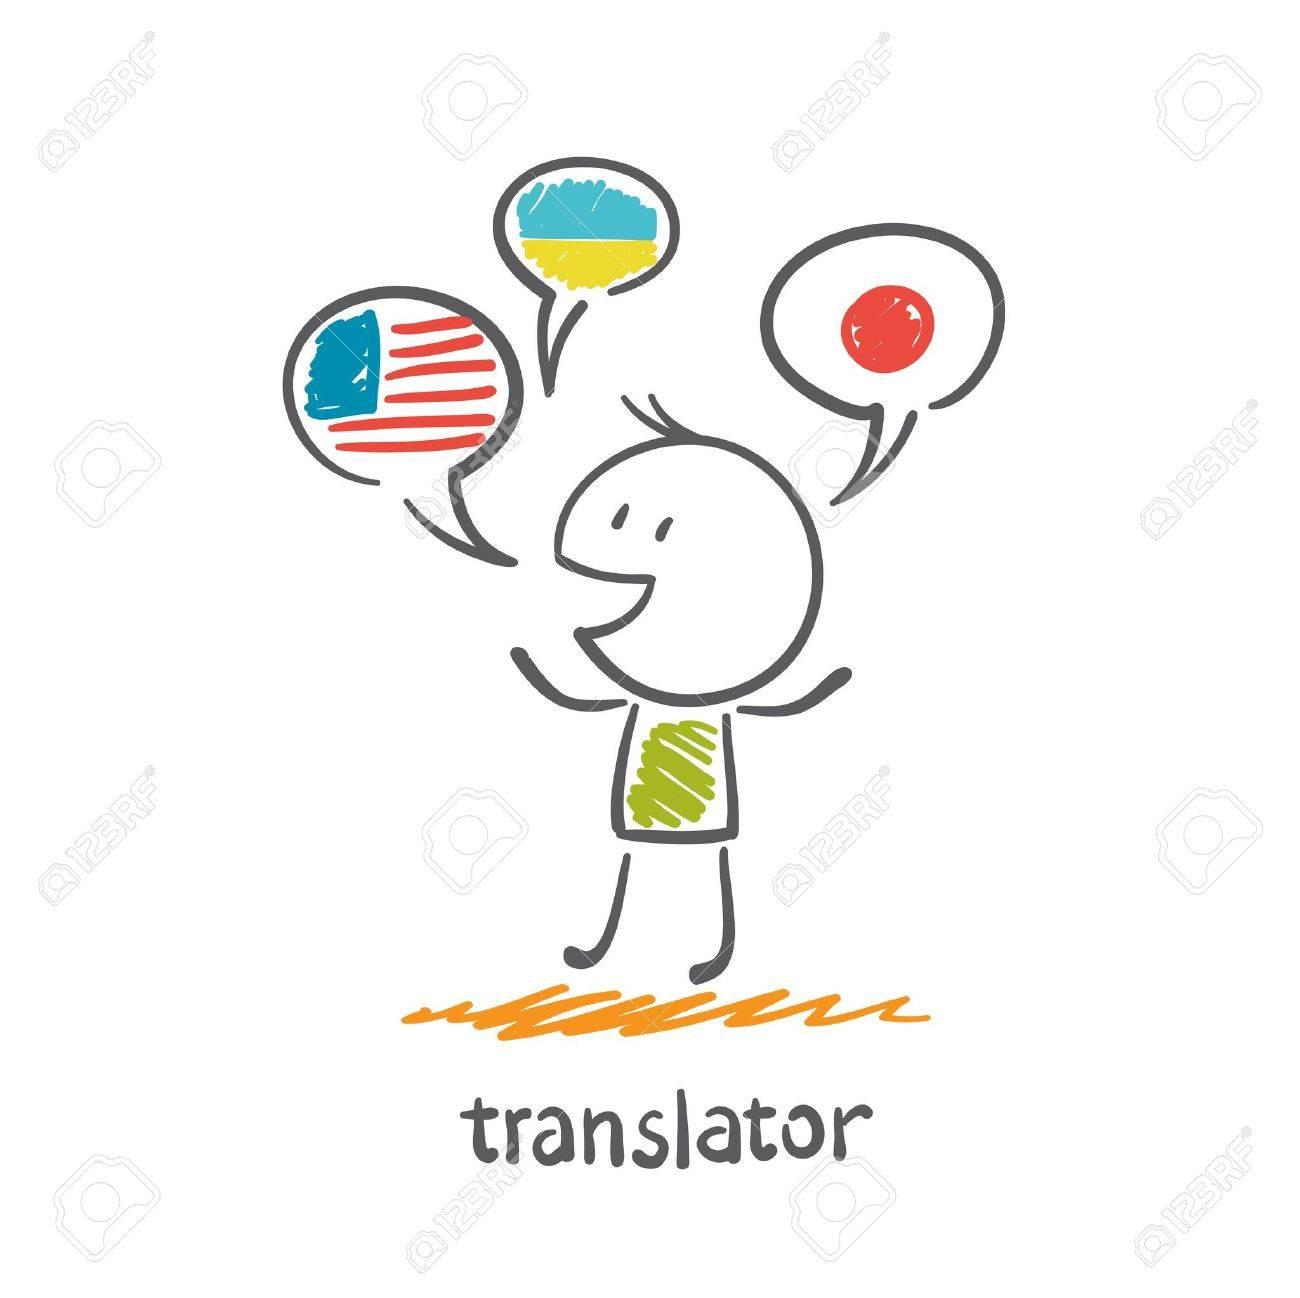 translator speaks different languages illustration - 36068764